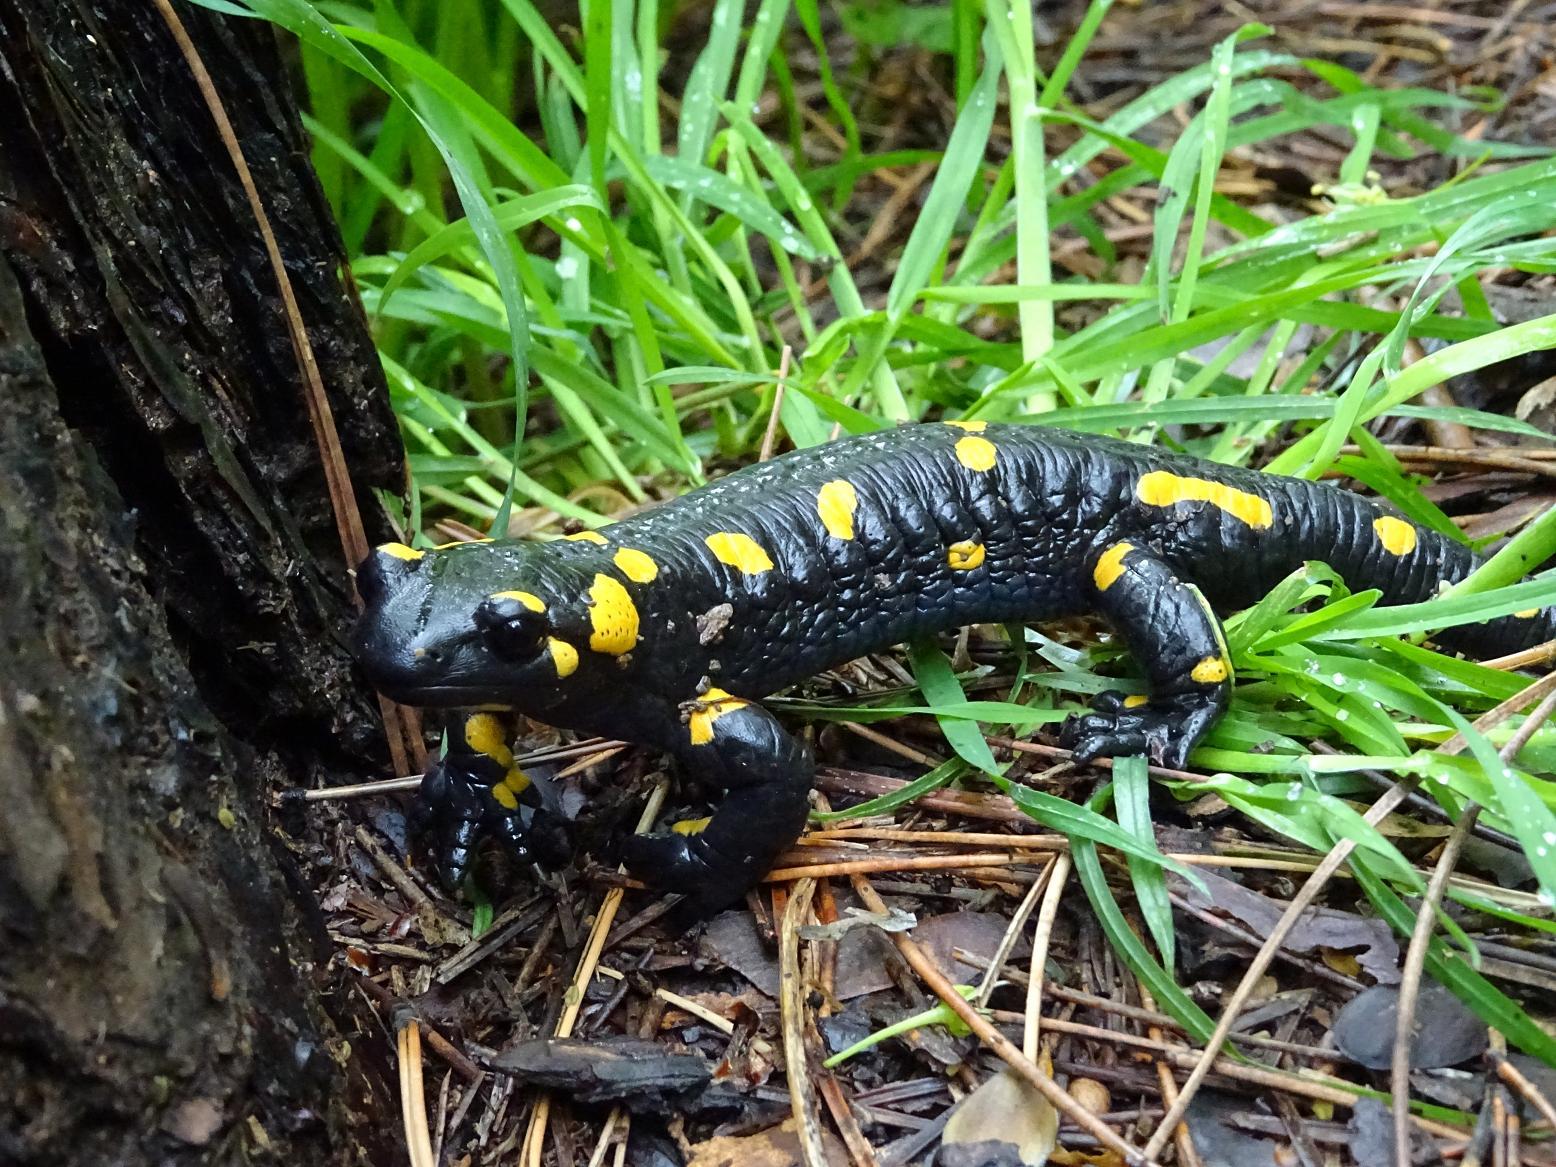 Огненная саламандра (Salamandra salamandra). Автор фото: Кирилова Любовь